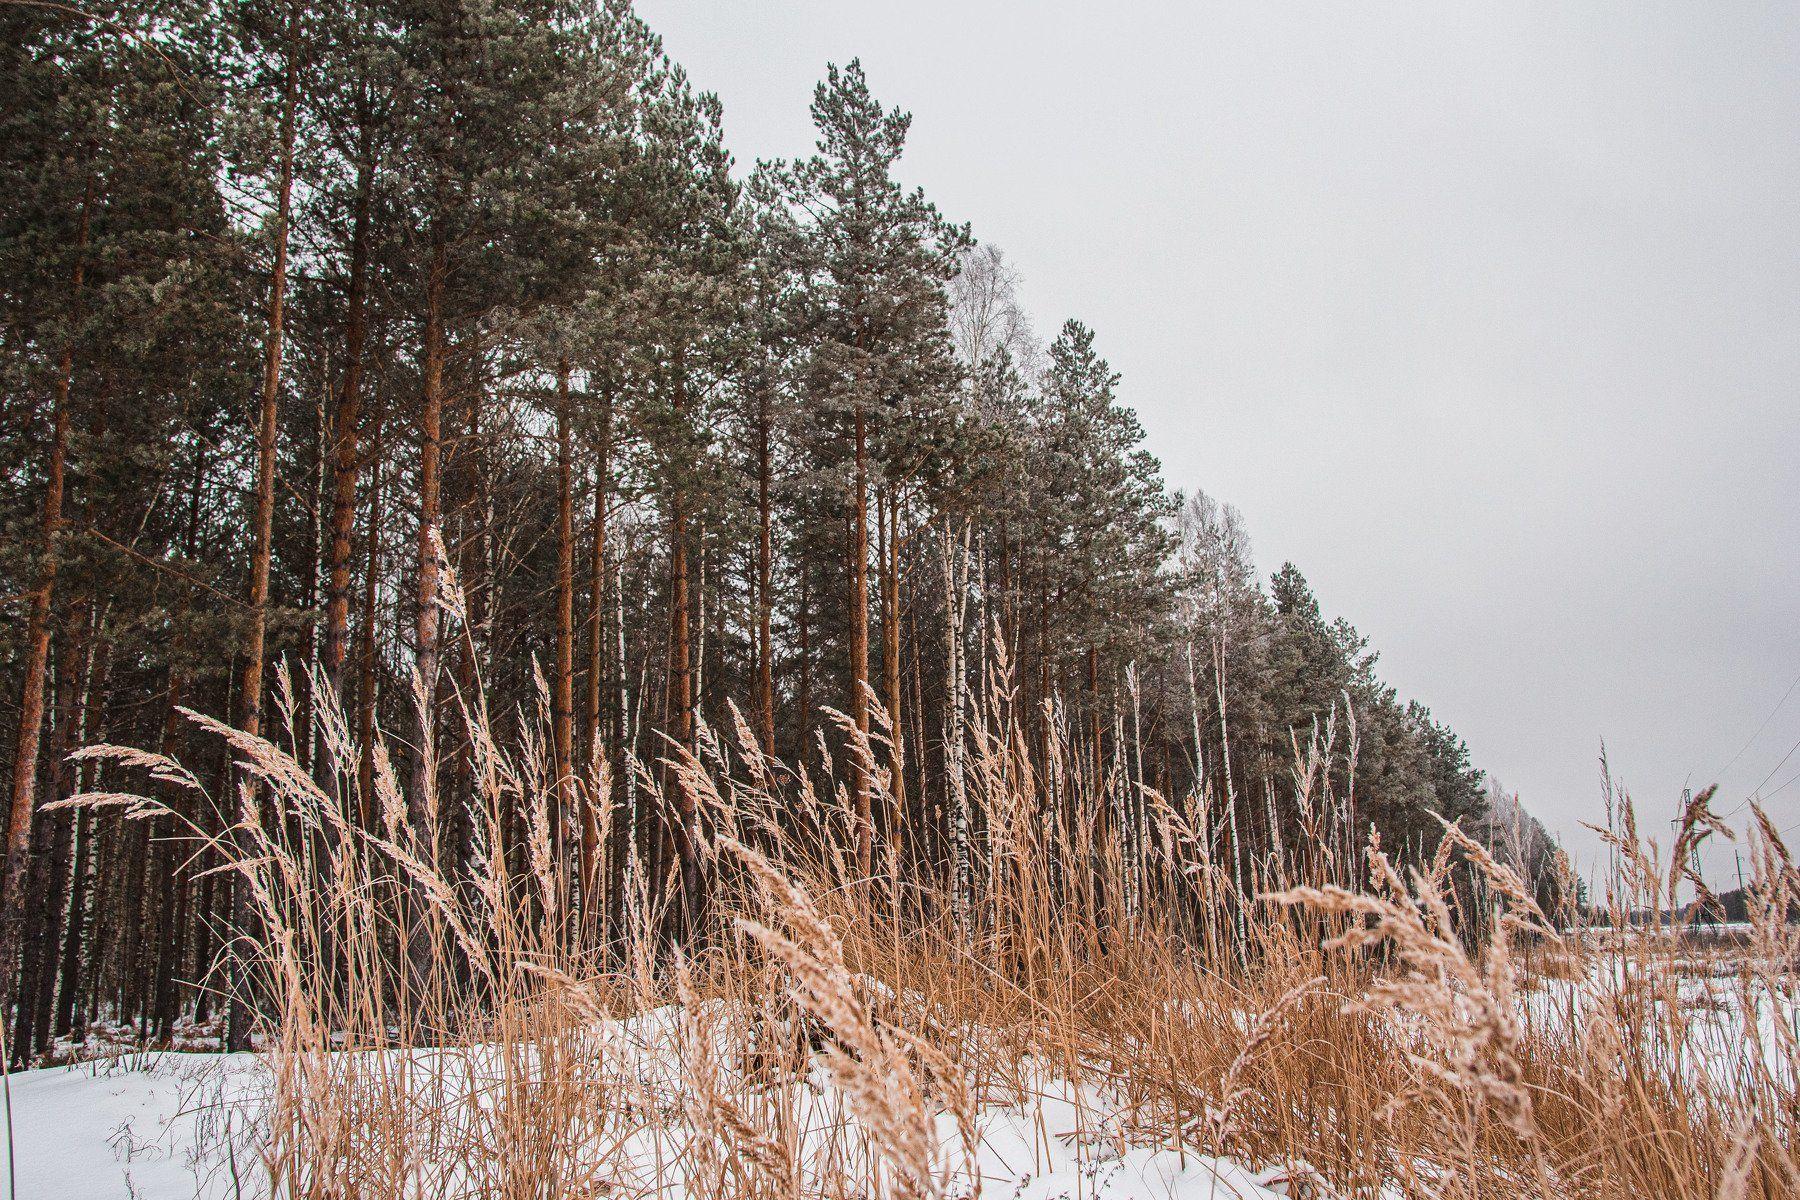 пейзаж, кулебаки, landscape, winter, зима, снег, snow, forest, сосны, pine trees, Васильев Владимир